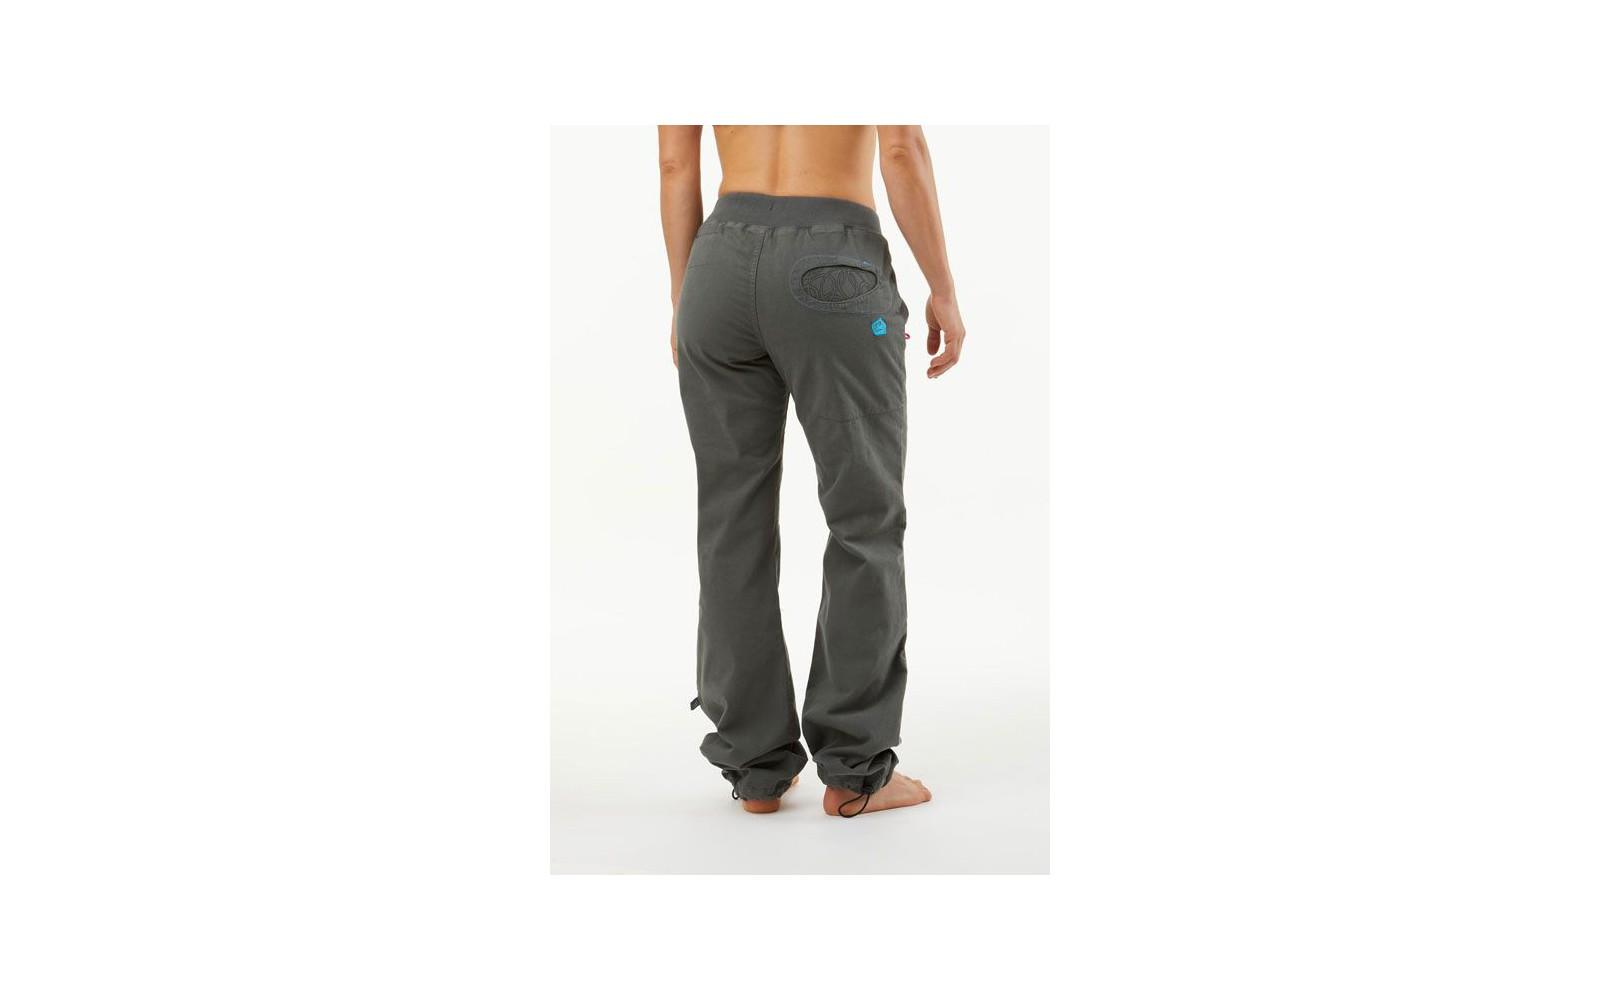 Pantalon E9 Onda Slim Ropa Varios S